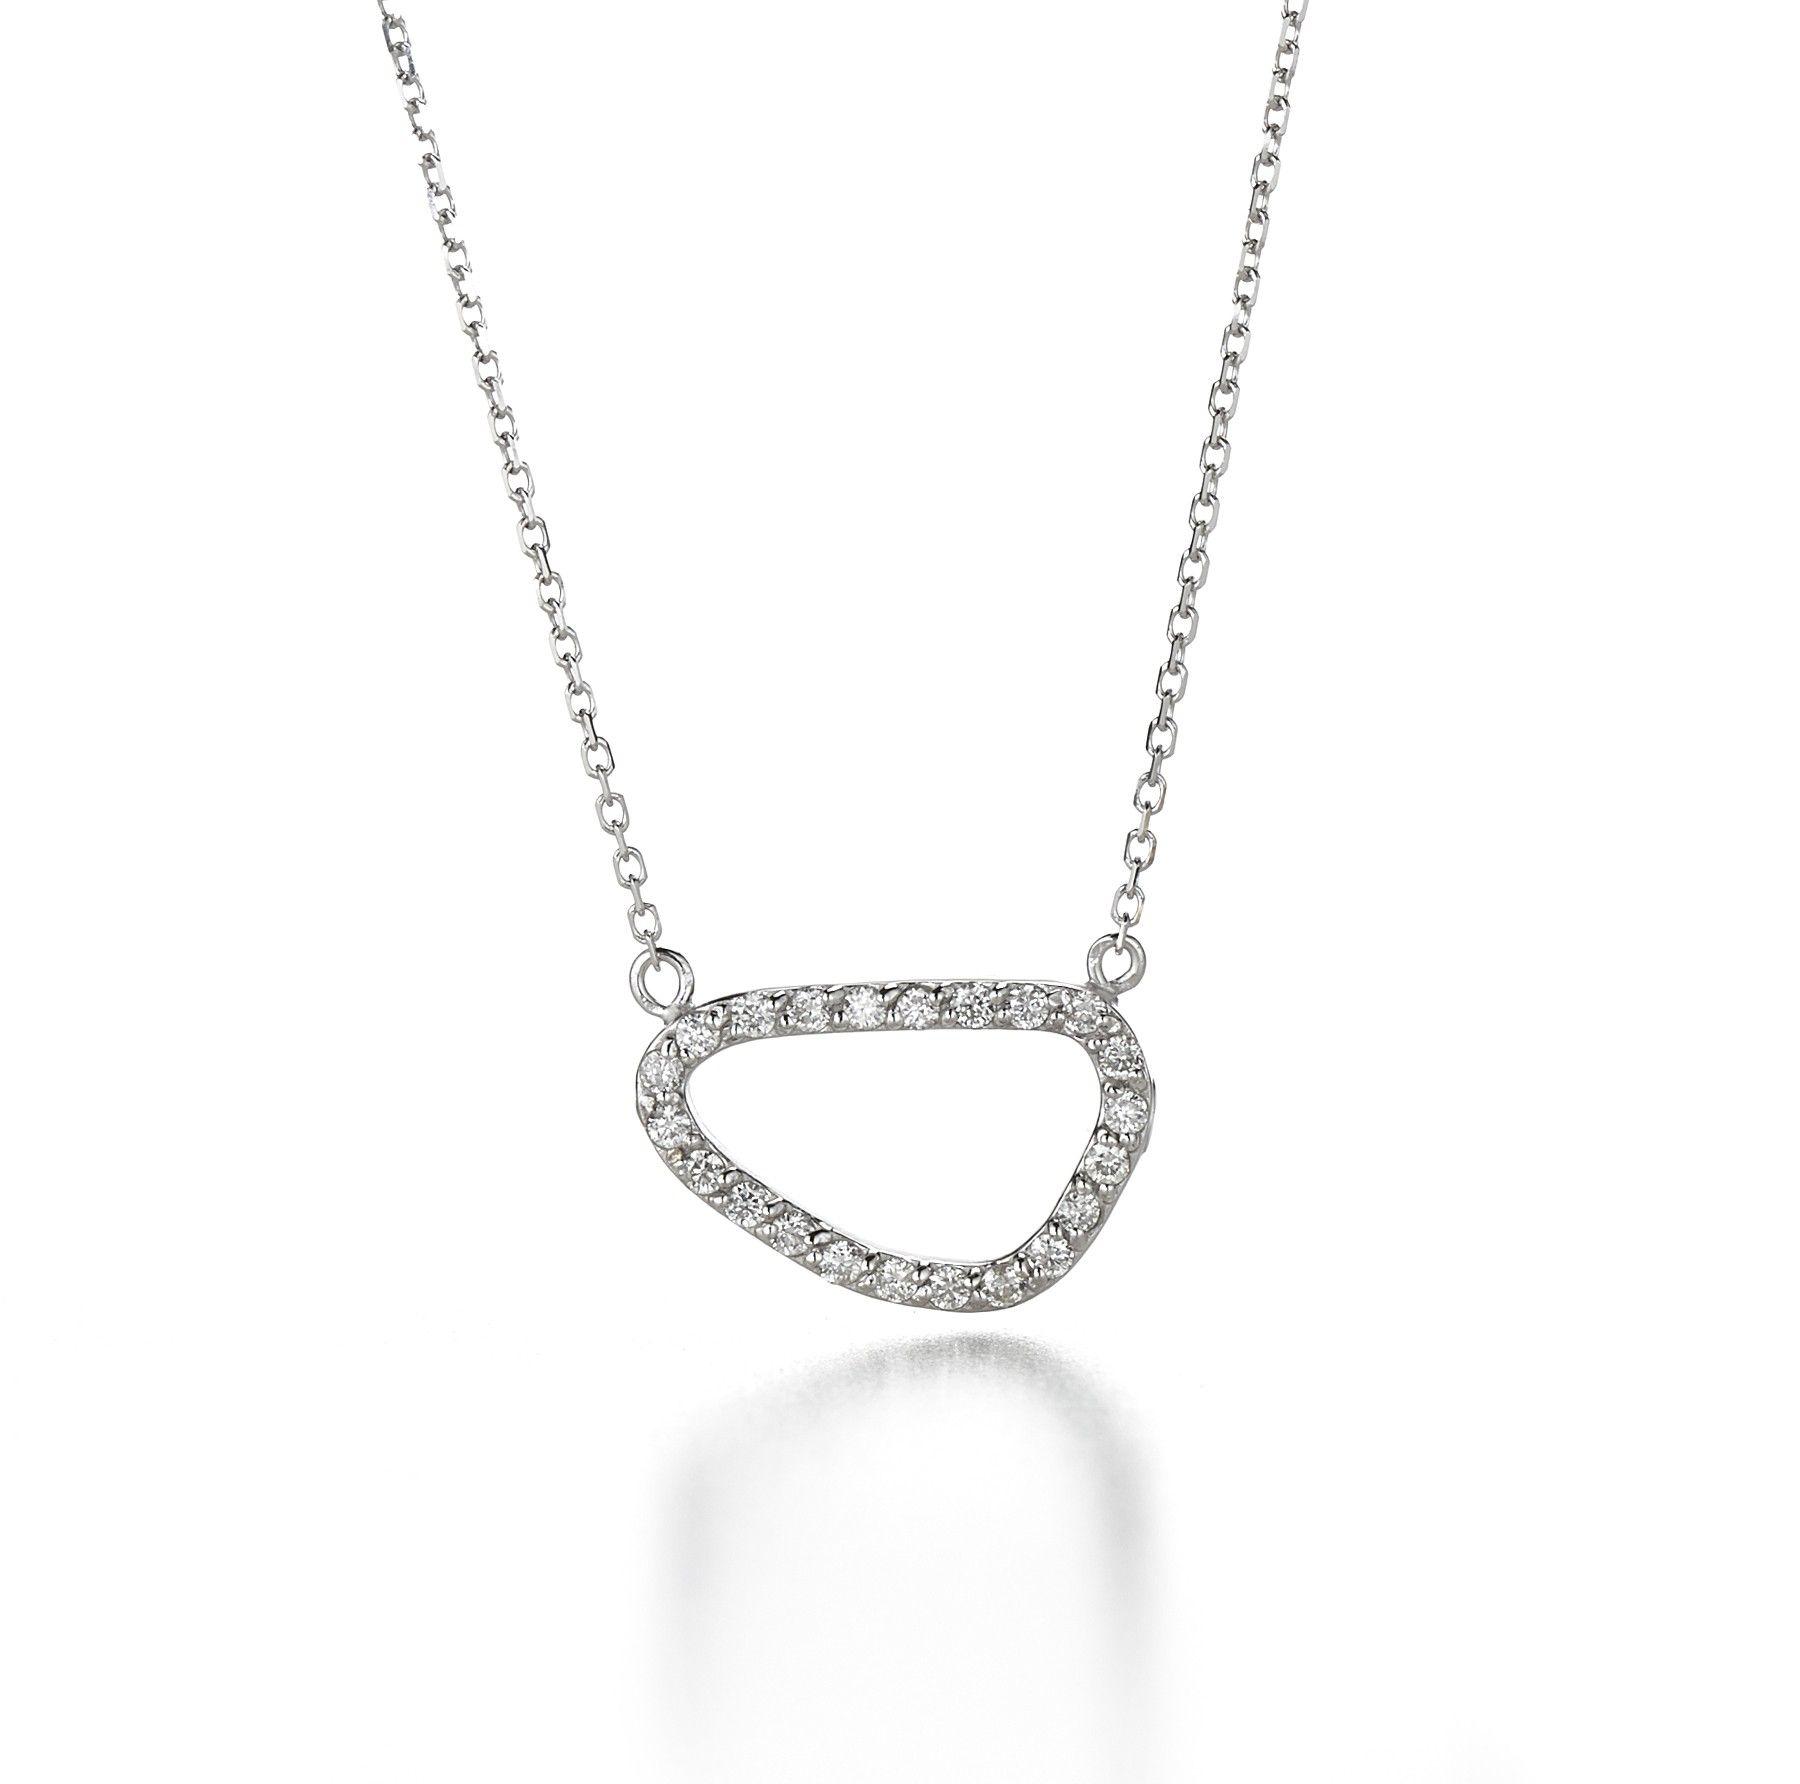 a3ad476464beb9 Large organic necklace   Jewelry i'd like 500-700   Jewelry, Fine ...